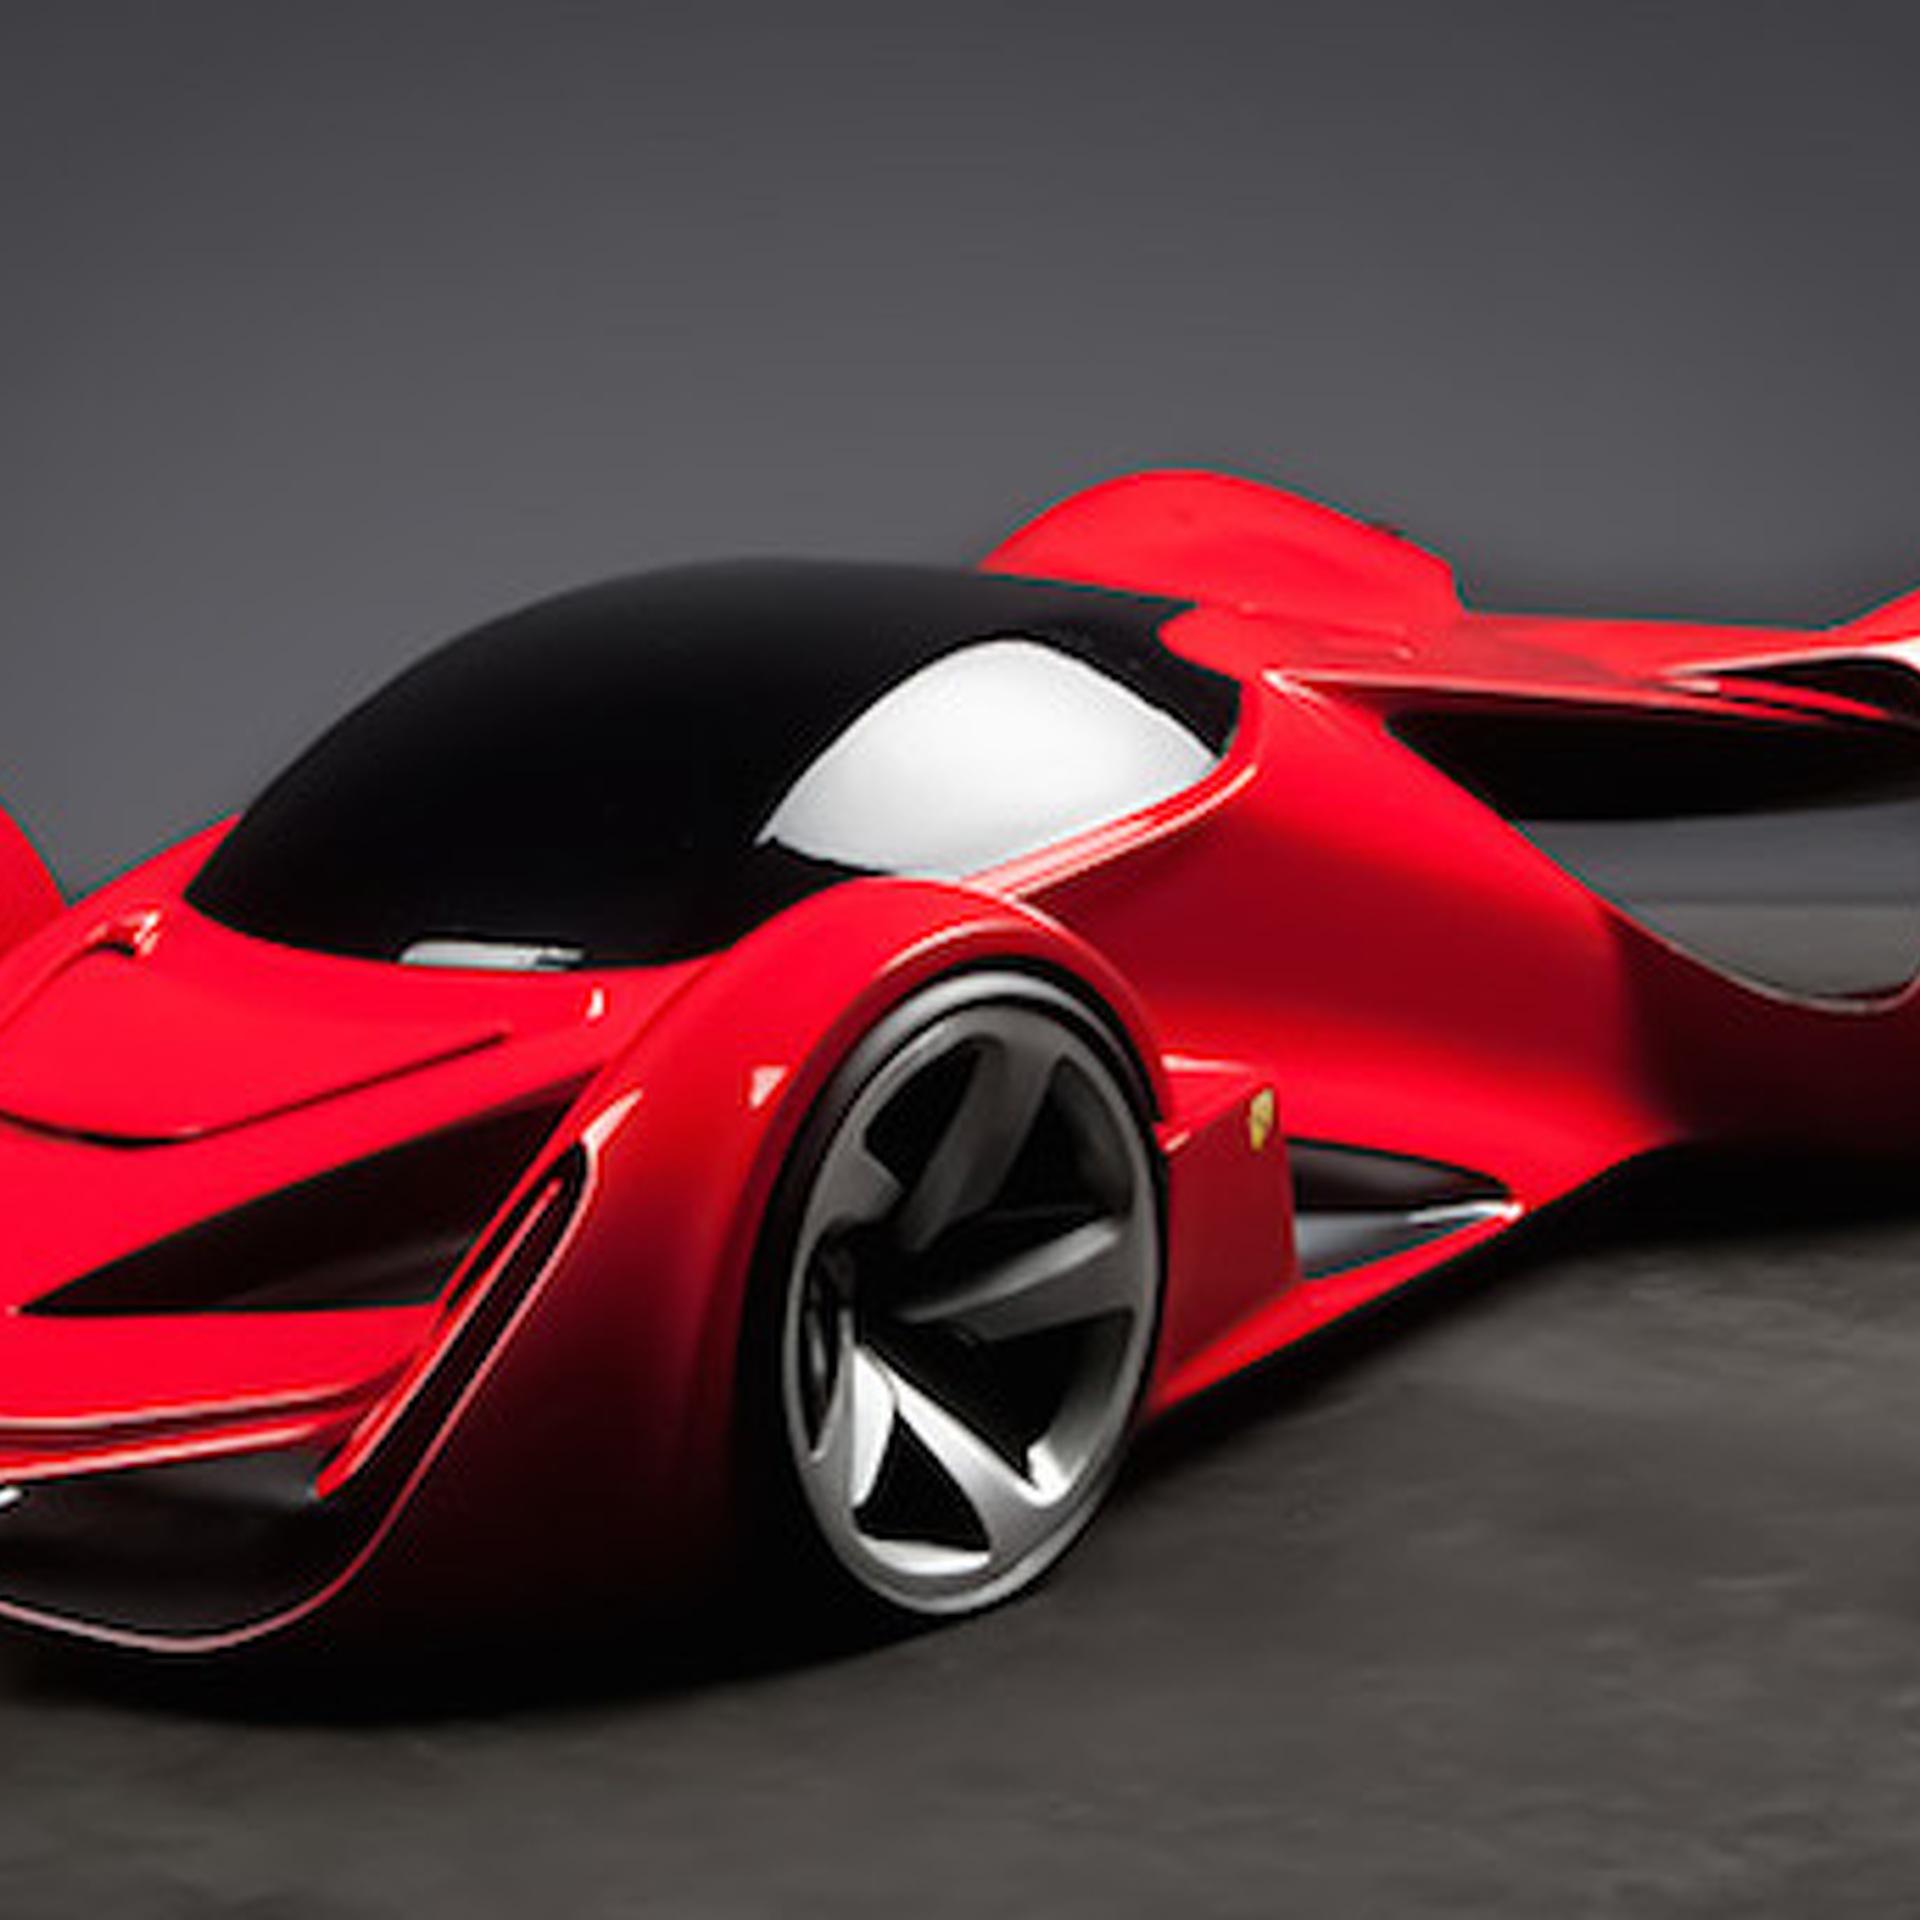 Ferrari Brand: 12 Ferrari Concept Cars That Could Preview The Future Of